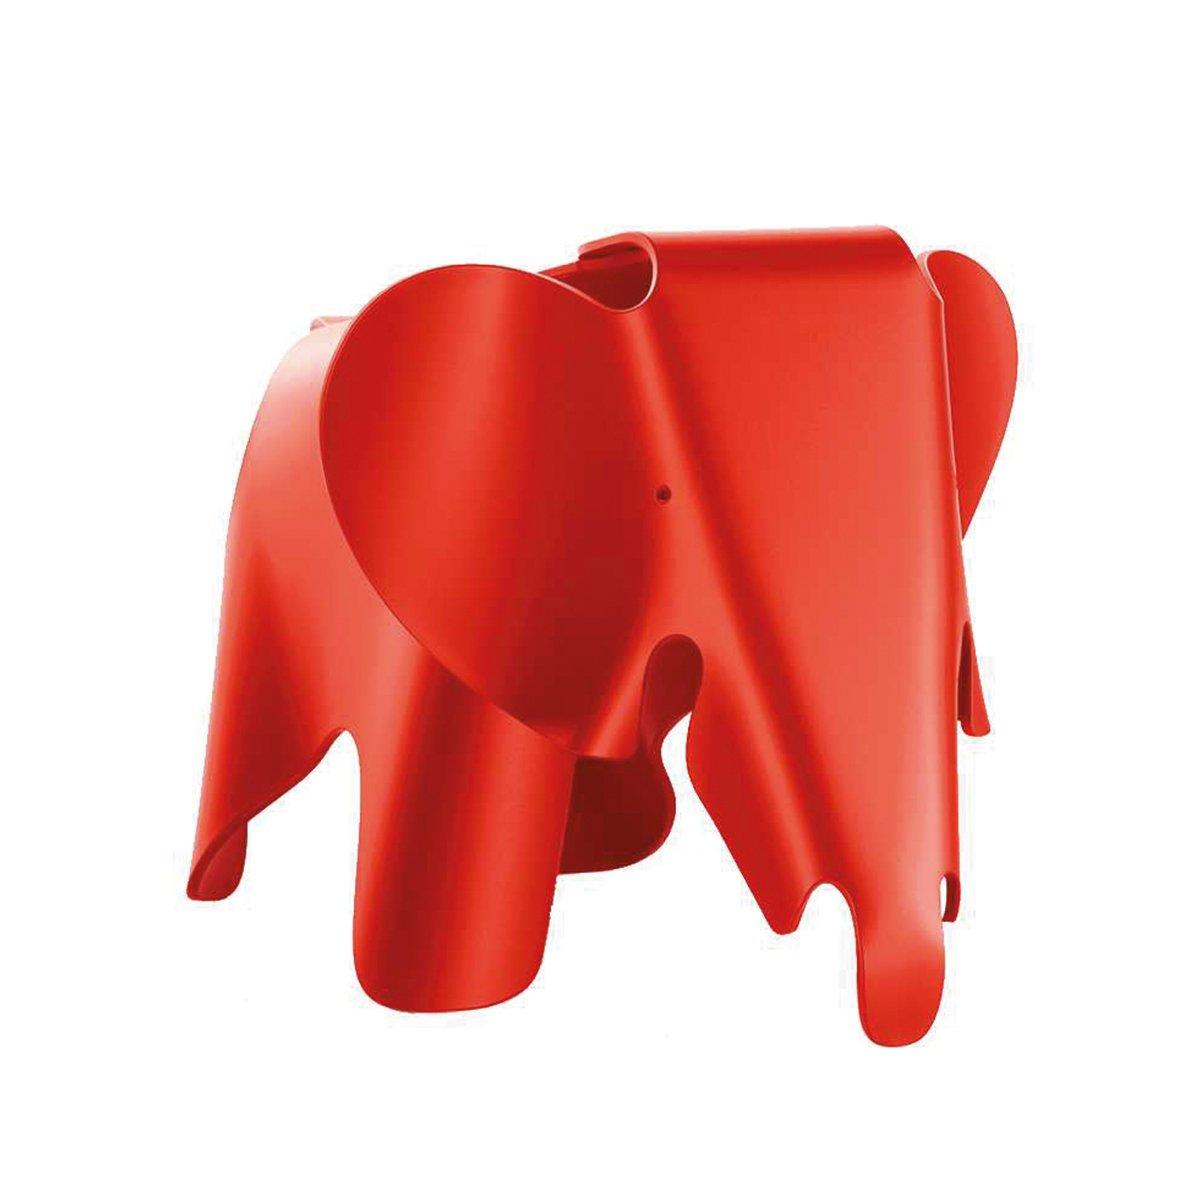 Vitra Eames Elephant Small Rood